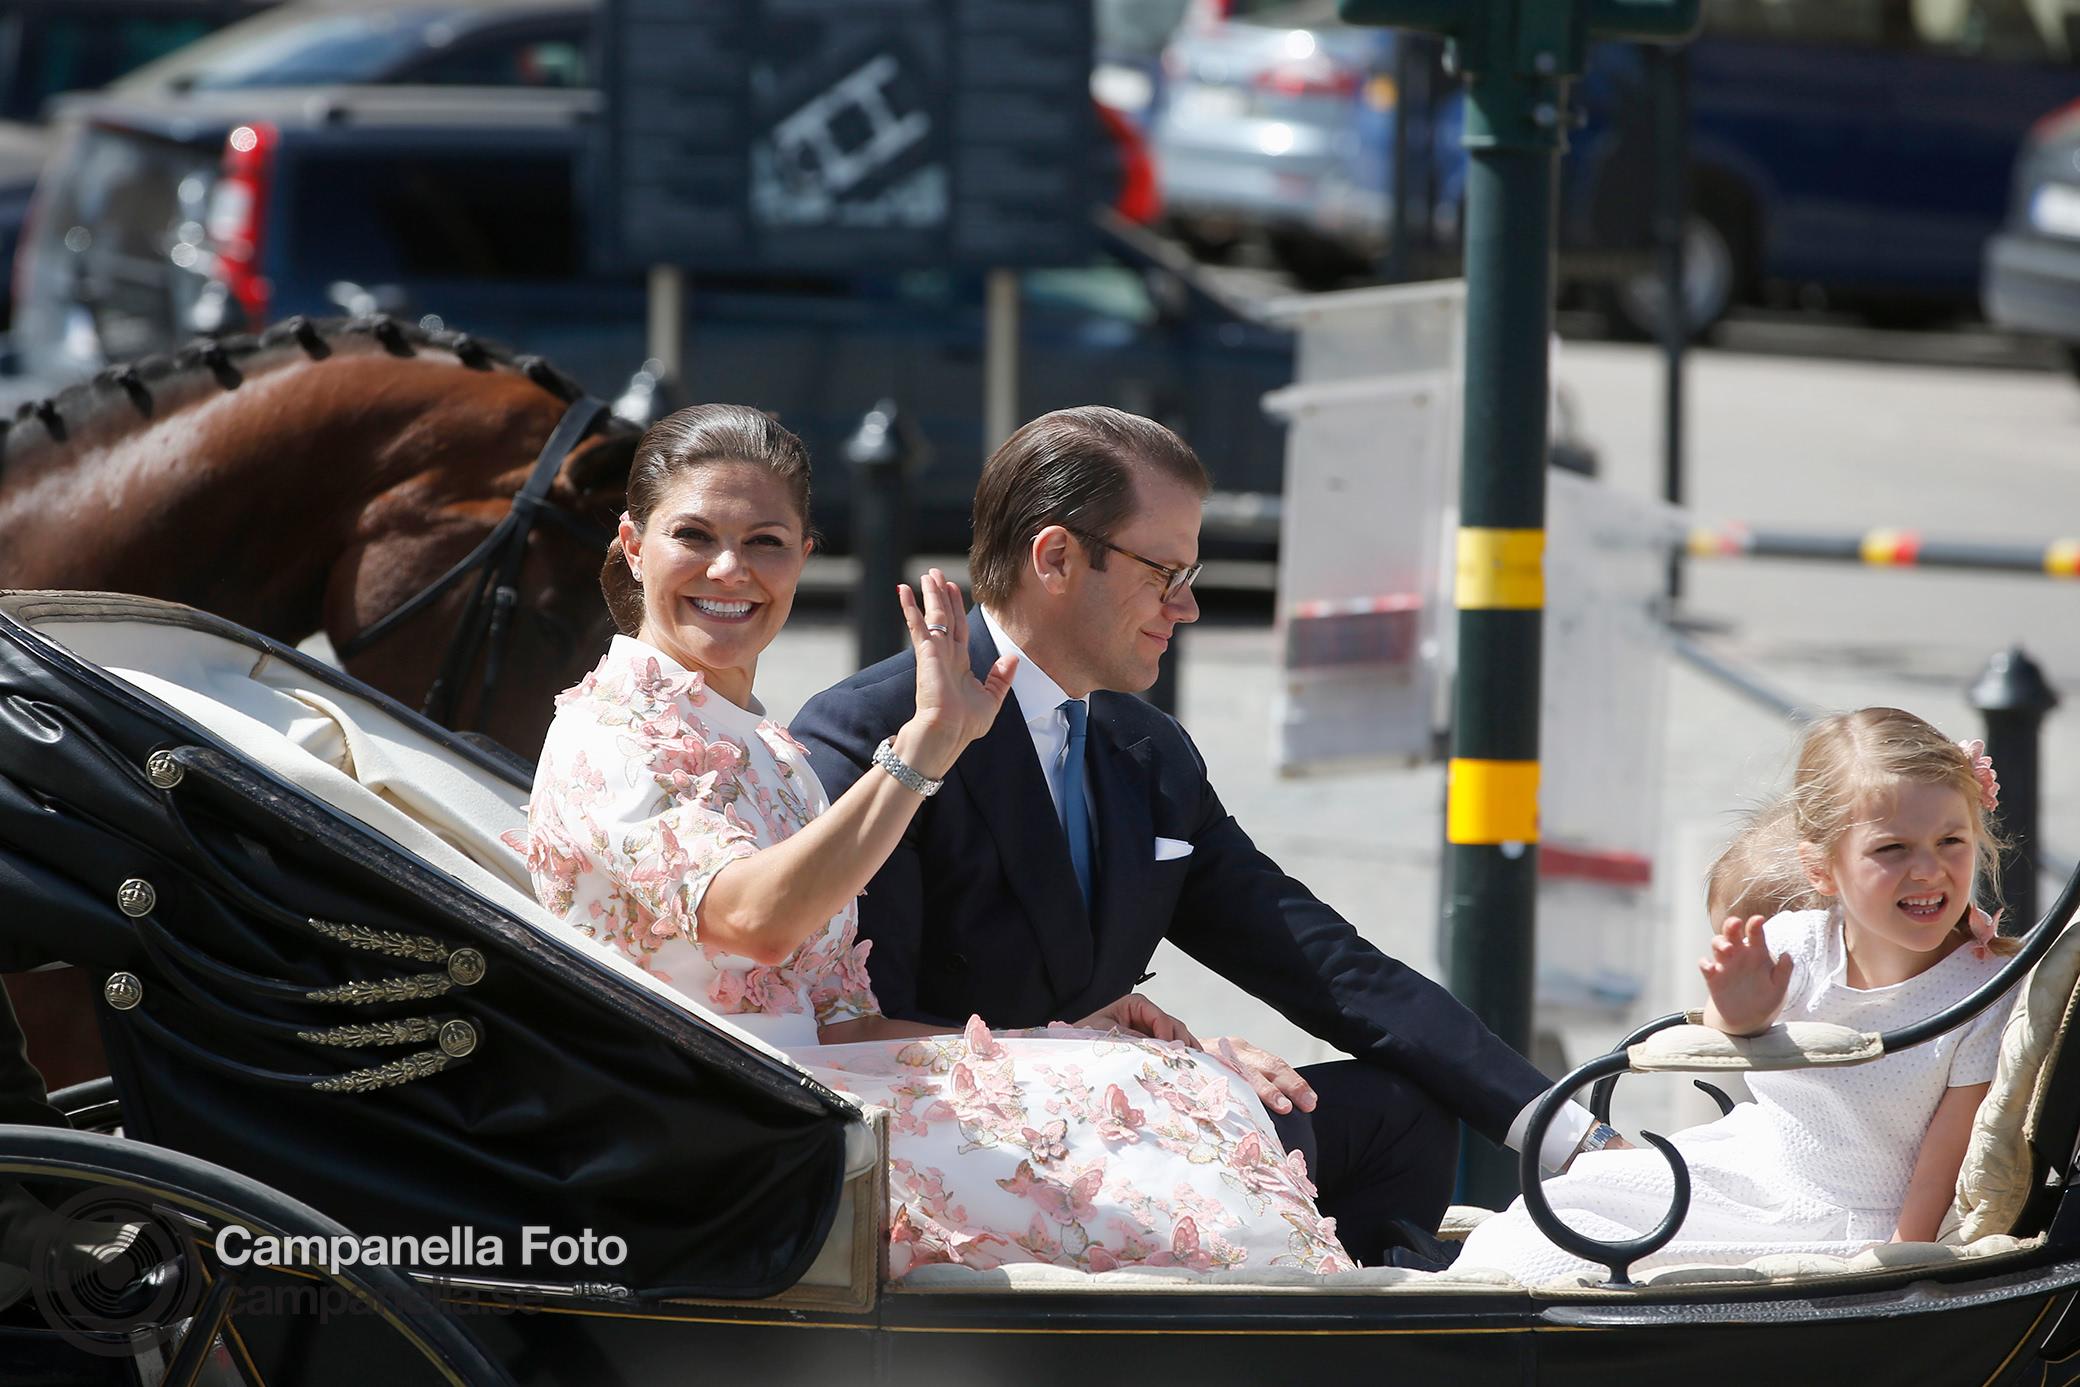 Happy 40th birthday Princess Victoria - Michael Campanella Photography